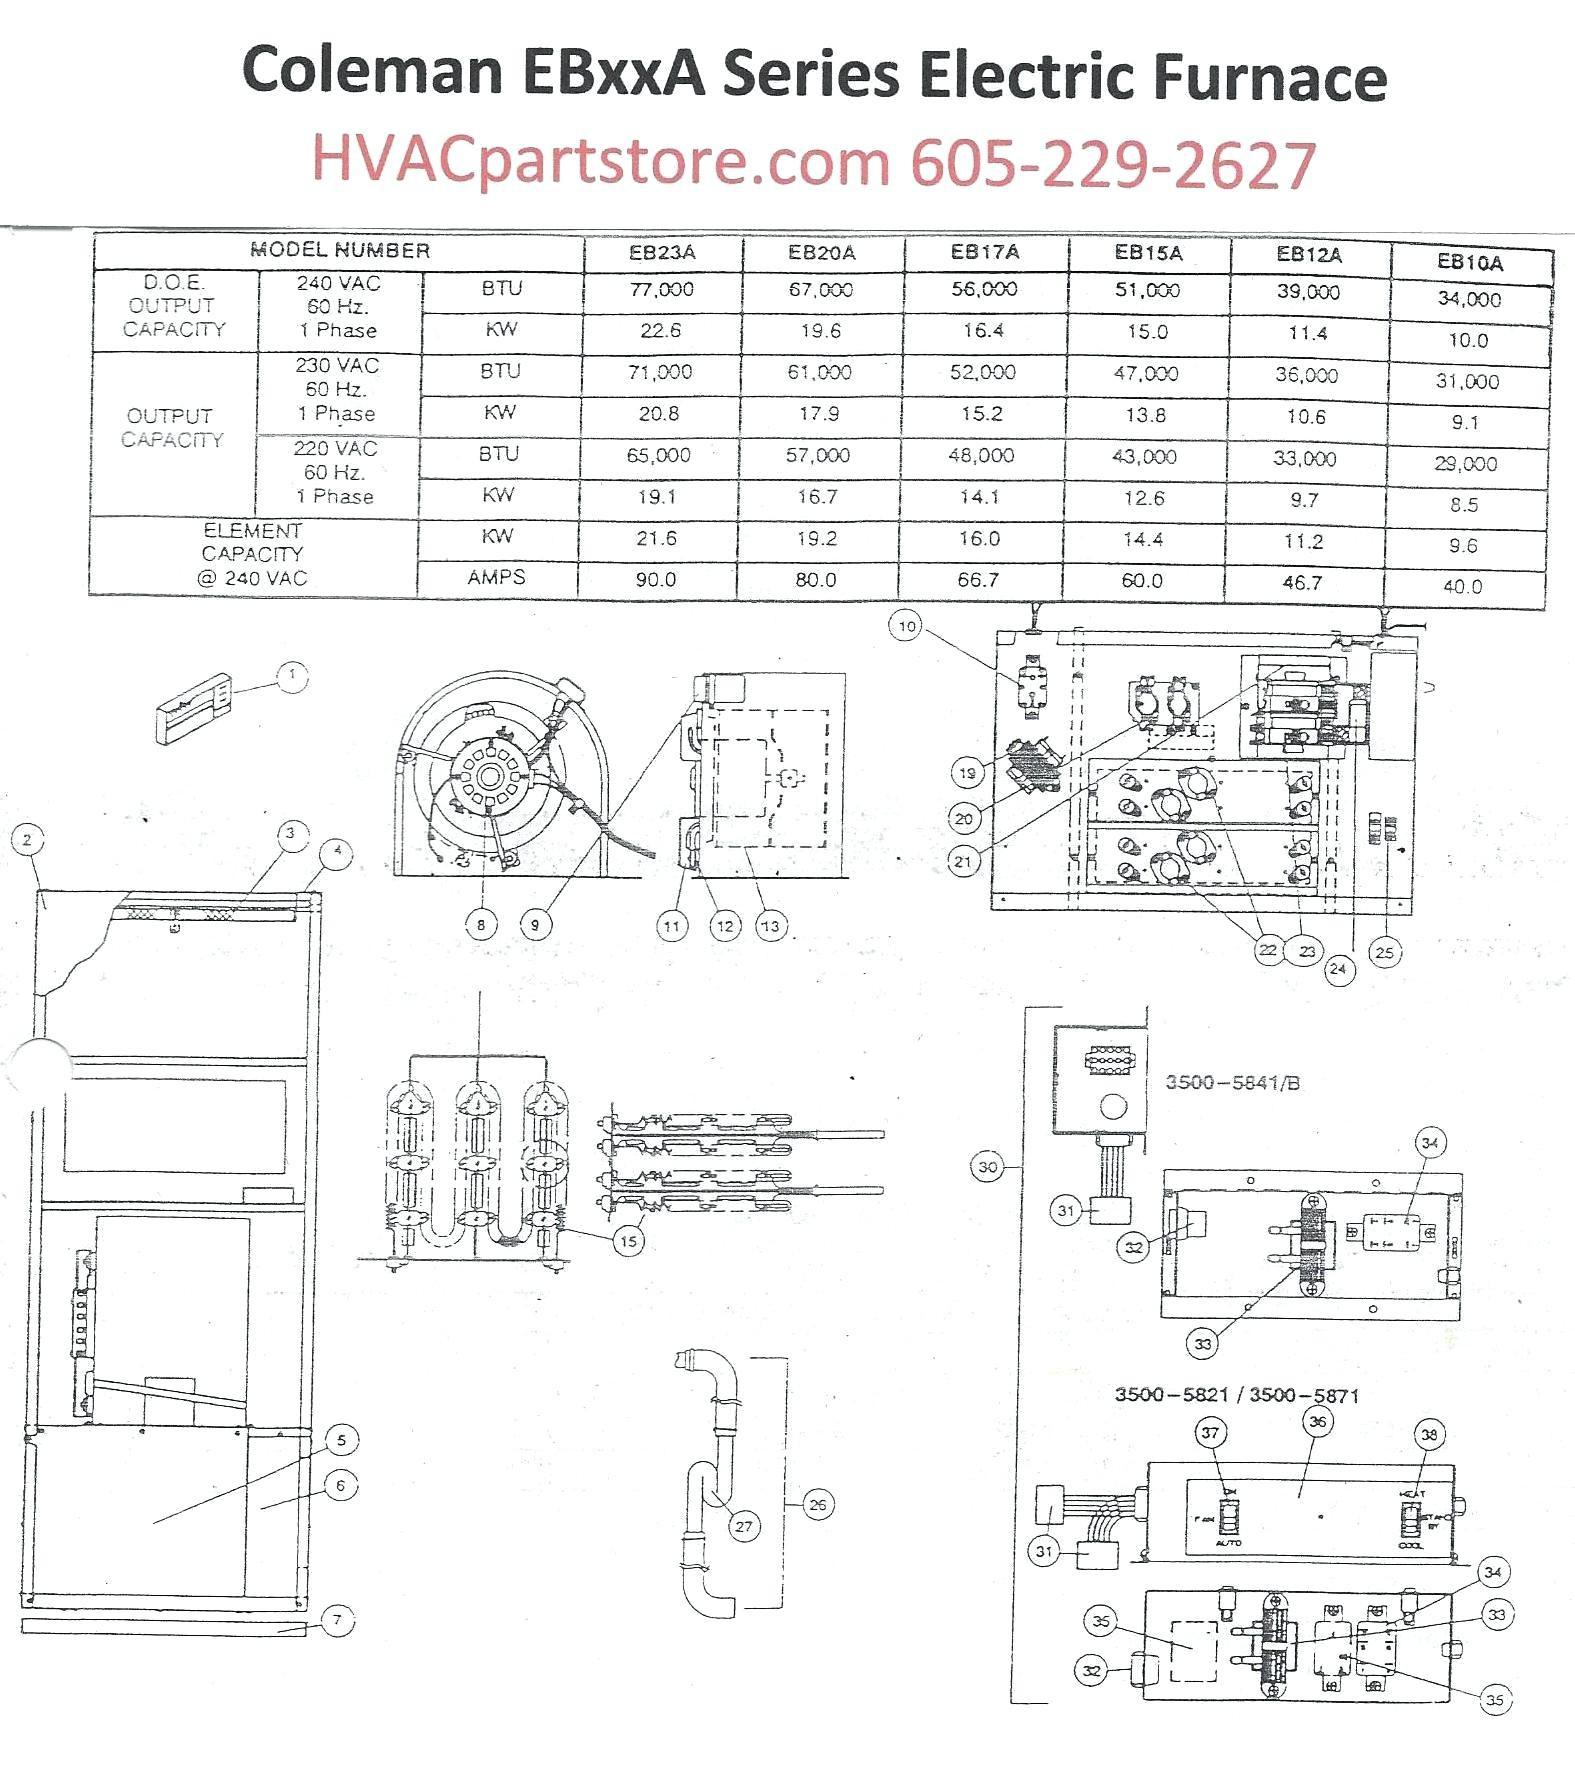 Wiring Diagram For Furnace Blower Motor